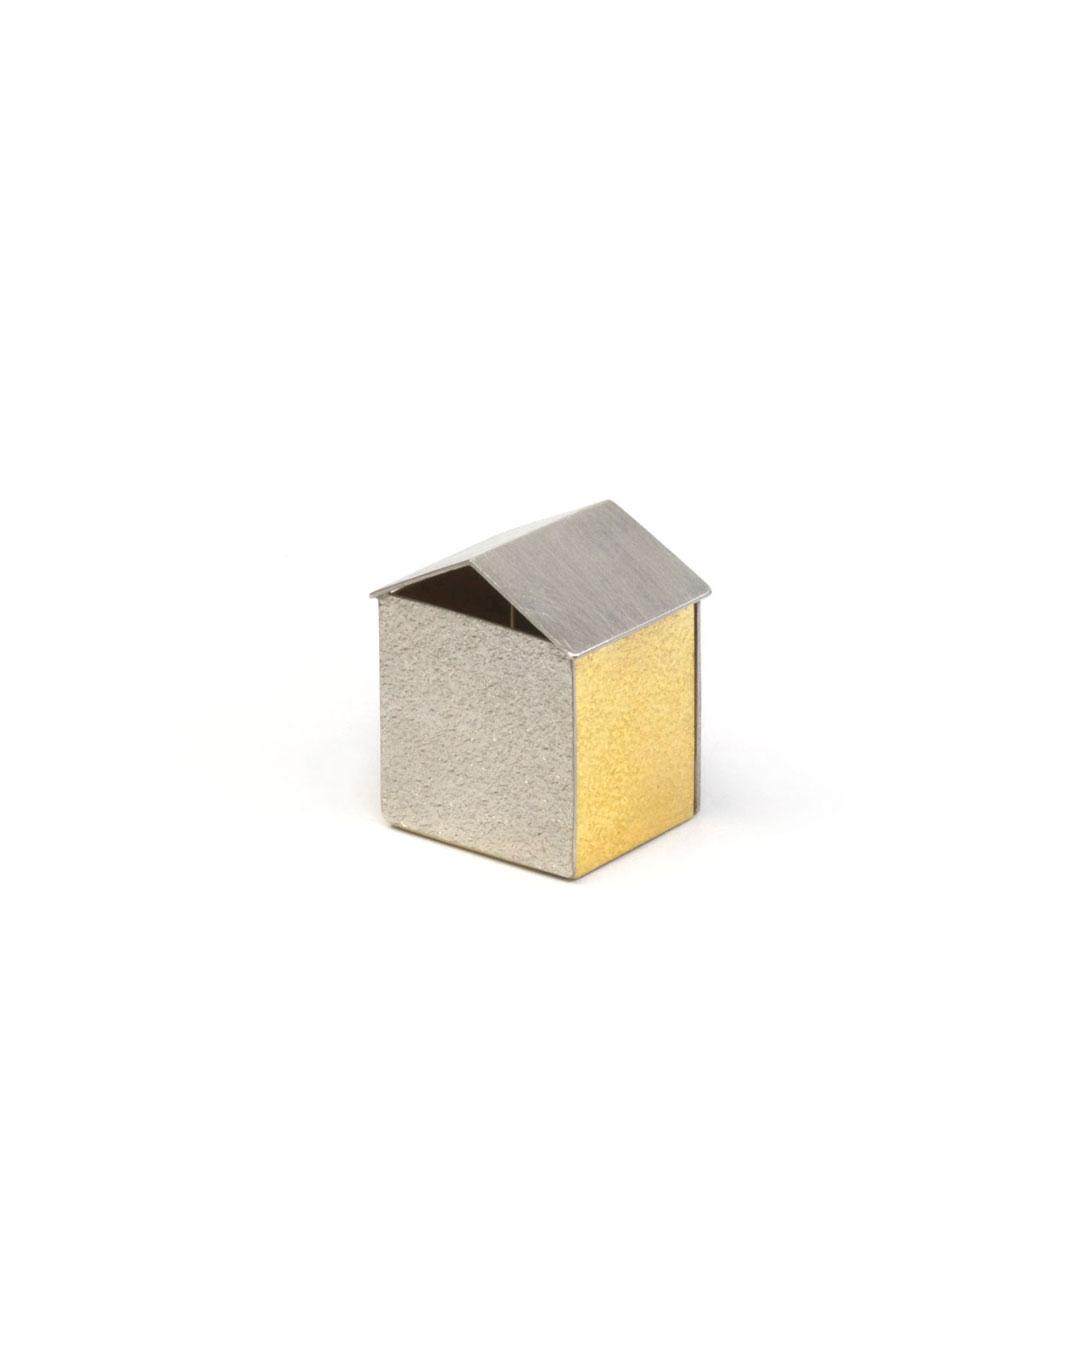 Okinari Kurokawa, untitled, 2008, ring; 970 silver, 835 gold, 24 x 21 x 17 mm